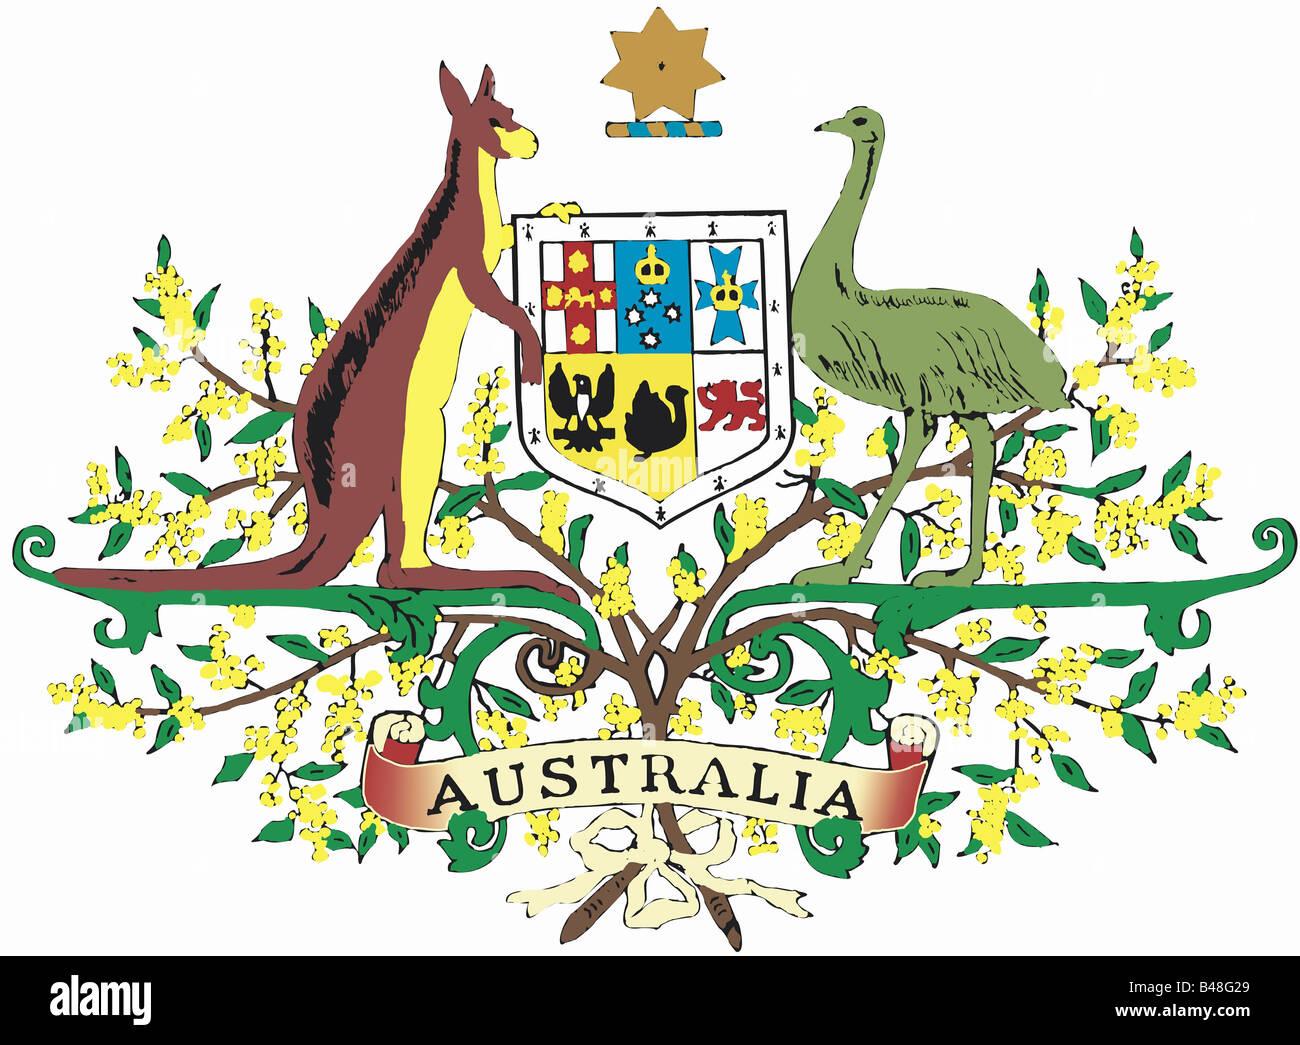 Australia coat of arms stock photos australia coat of arms stock heraldry coat of arms australia national coat of arms symbol emblem buycottarizona